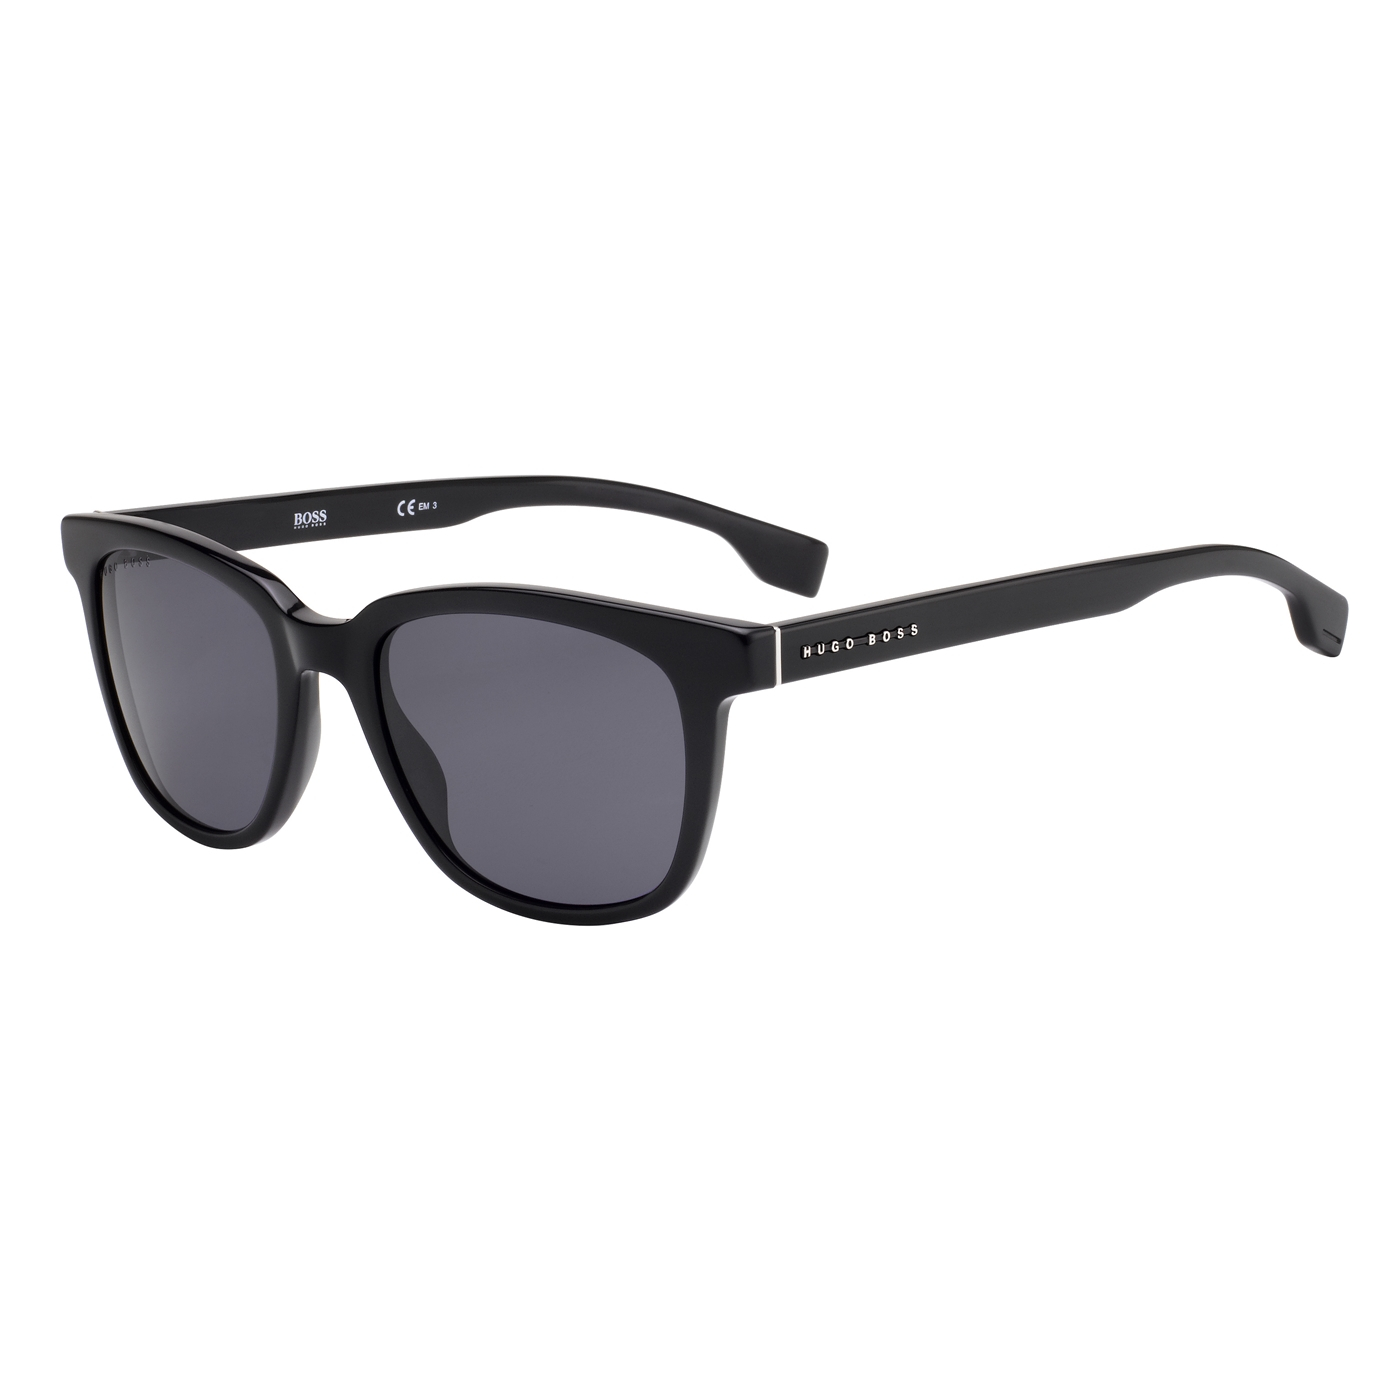 Bilde av Boss Black Sunglasses BOSS 1037S 807 51 IR